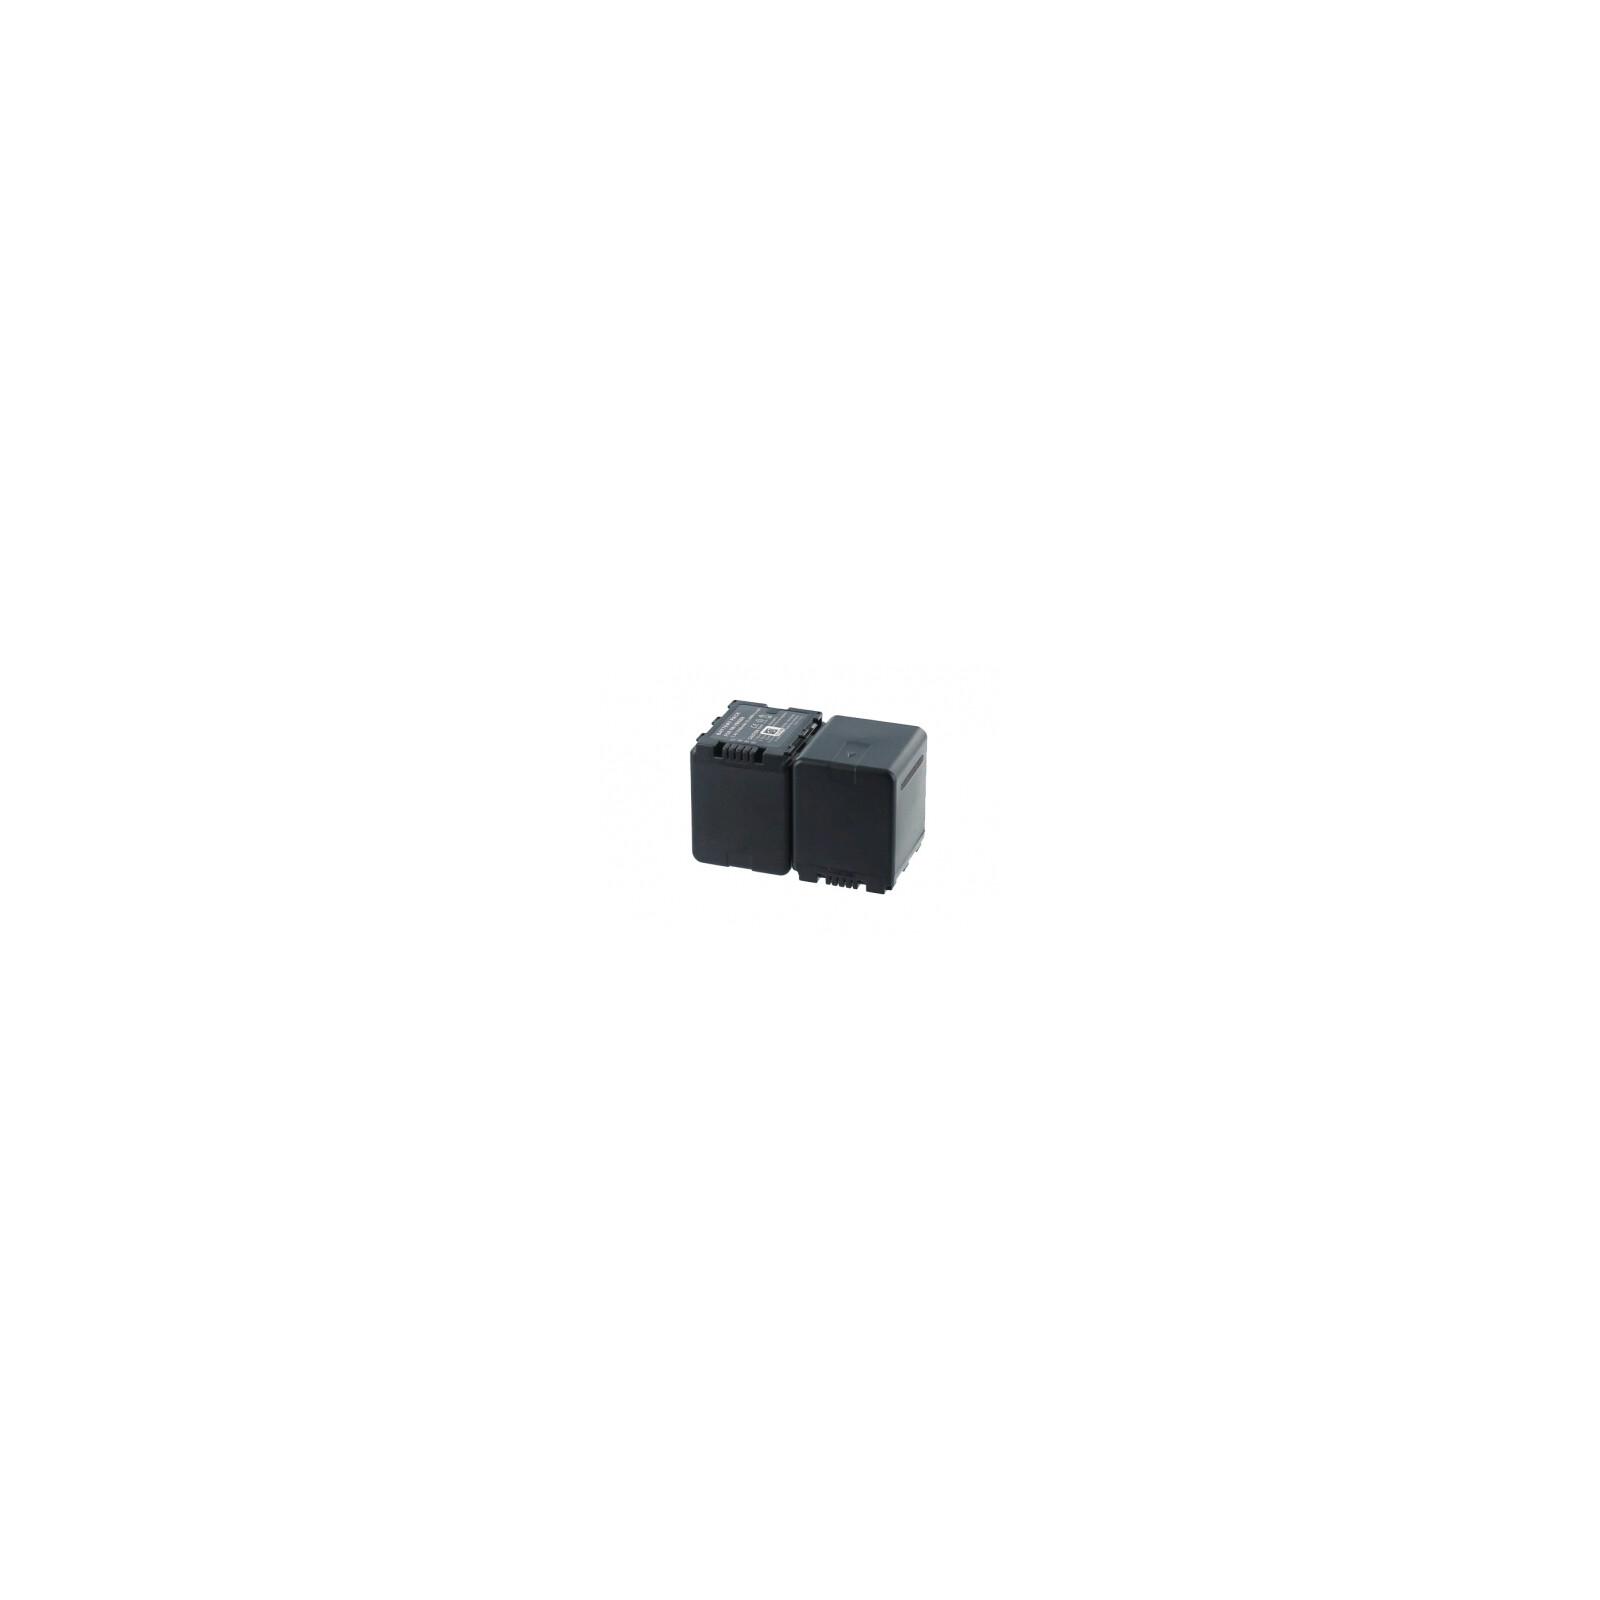 AGI 83285 Akku Panasonic HDC-SD909